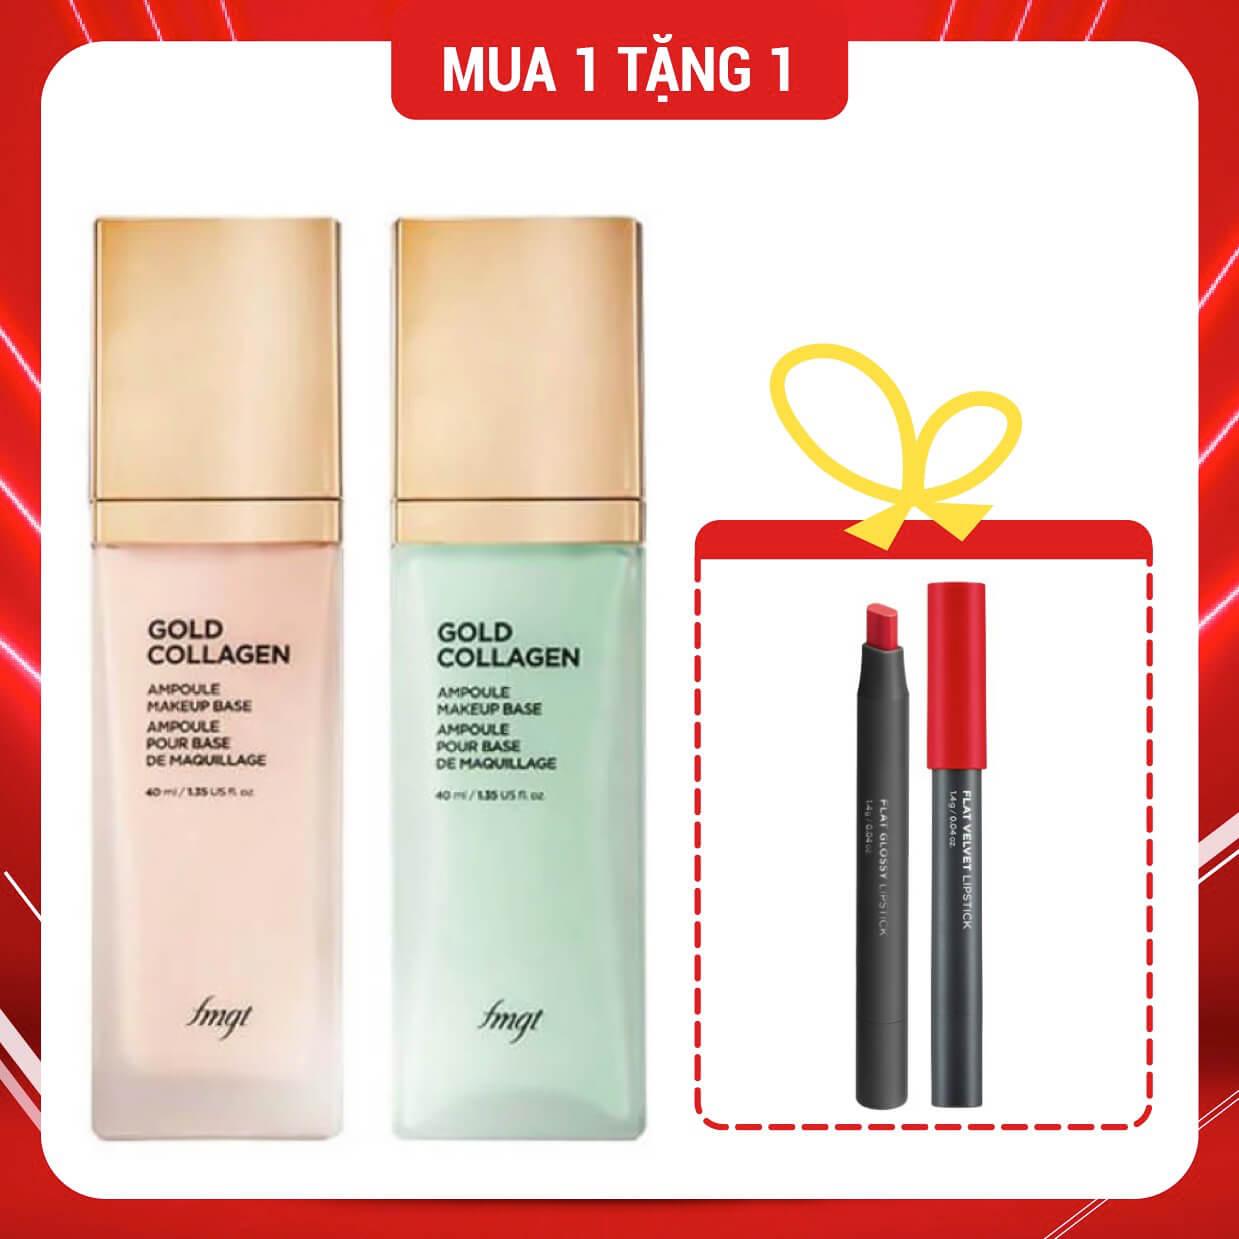 kem-lot-bo-sung-vang-collagen-thefaceshop-fmgt-gold-collagen-ampoule-makeup-base-spf30-pa-40ml